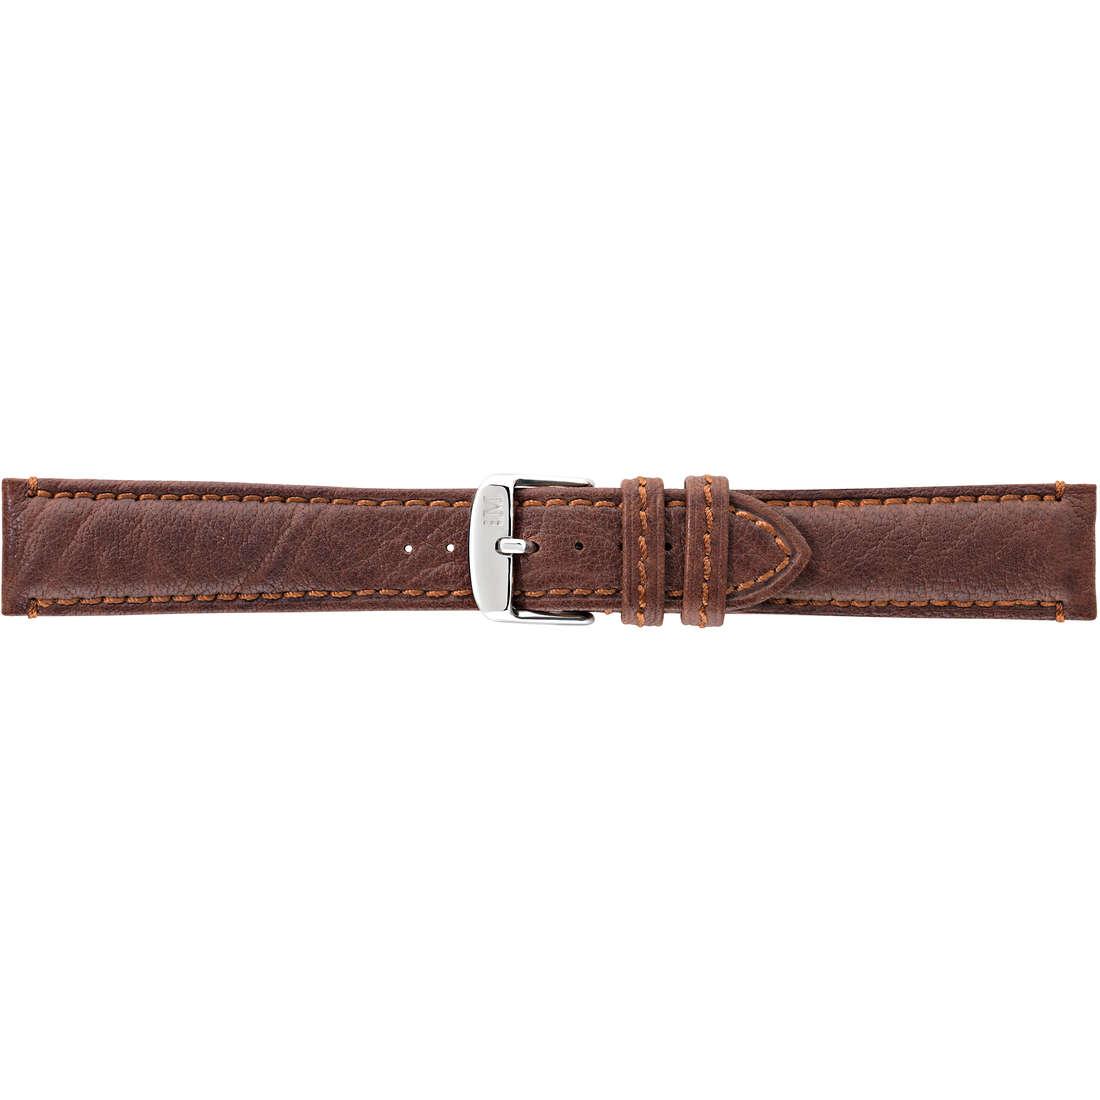 watch watch bands watch straps man Morellato Manufatti A01U3221767040CR22